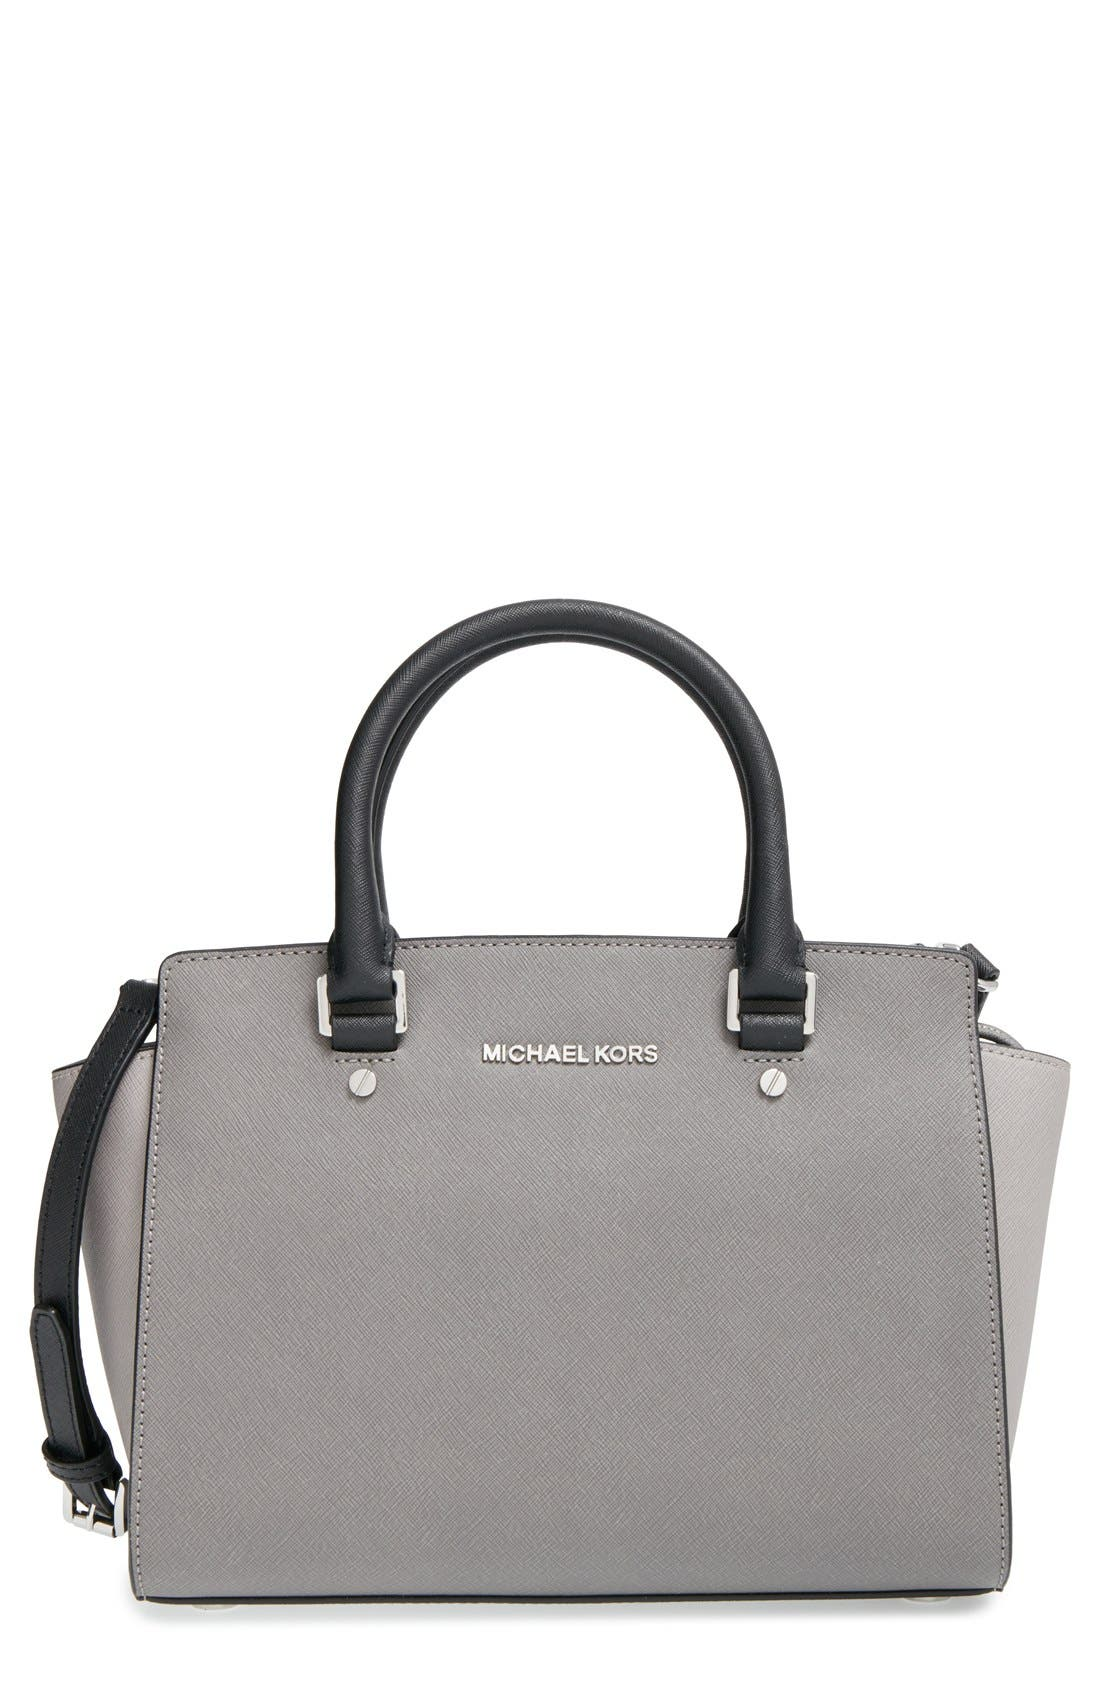 Main Image - MICHAEL Michael Kors 'Selma - Medium' Saffiano Leather Crossbody Bag